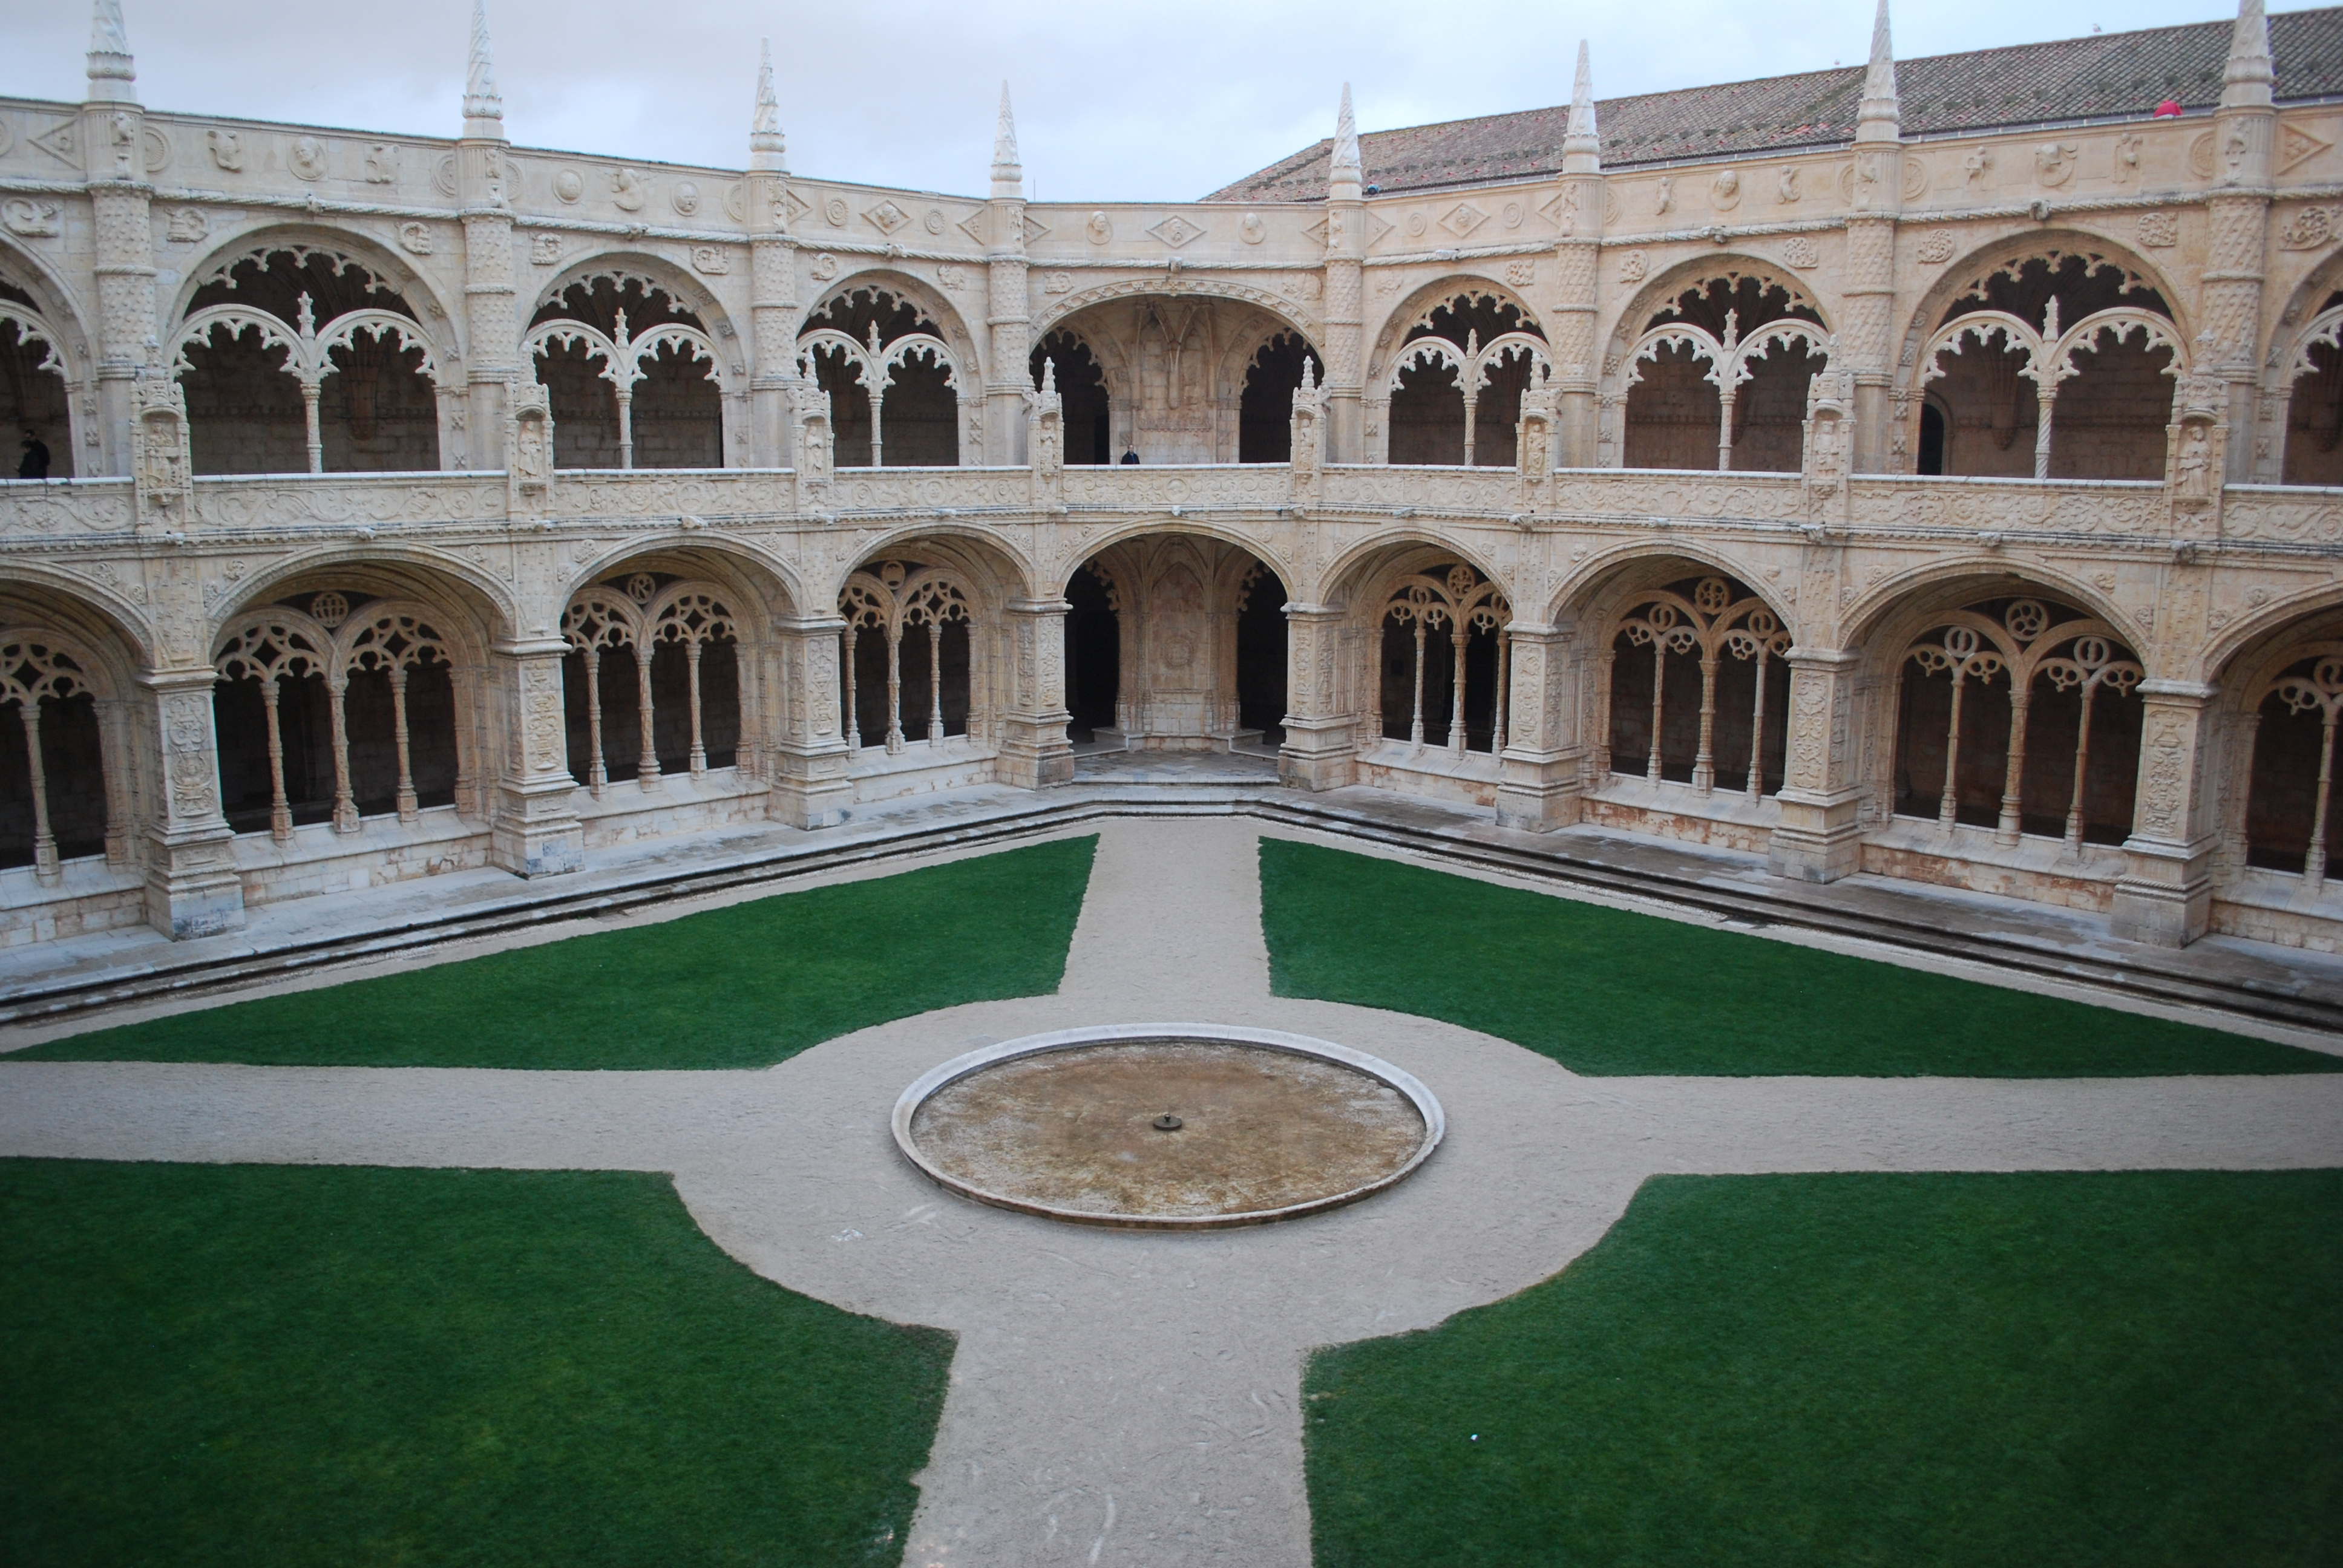 Conhecido File:Lisboa - Mosteiro dos Jerónimos - Claustro.jpg - Wikimedia  FX18